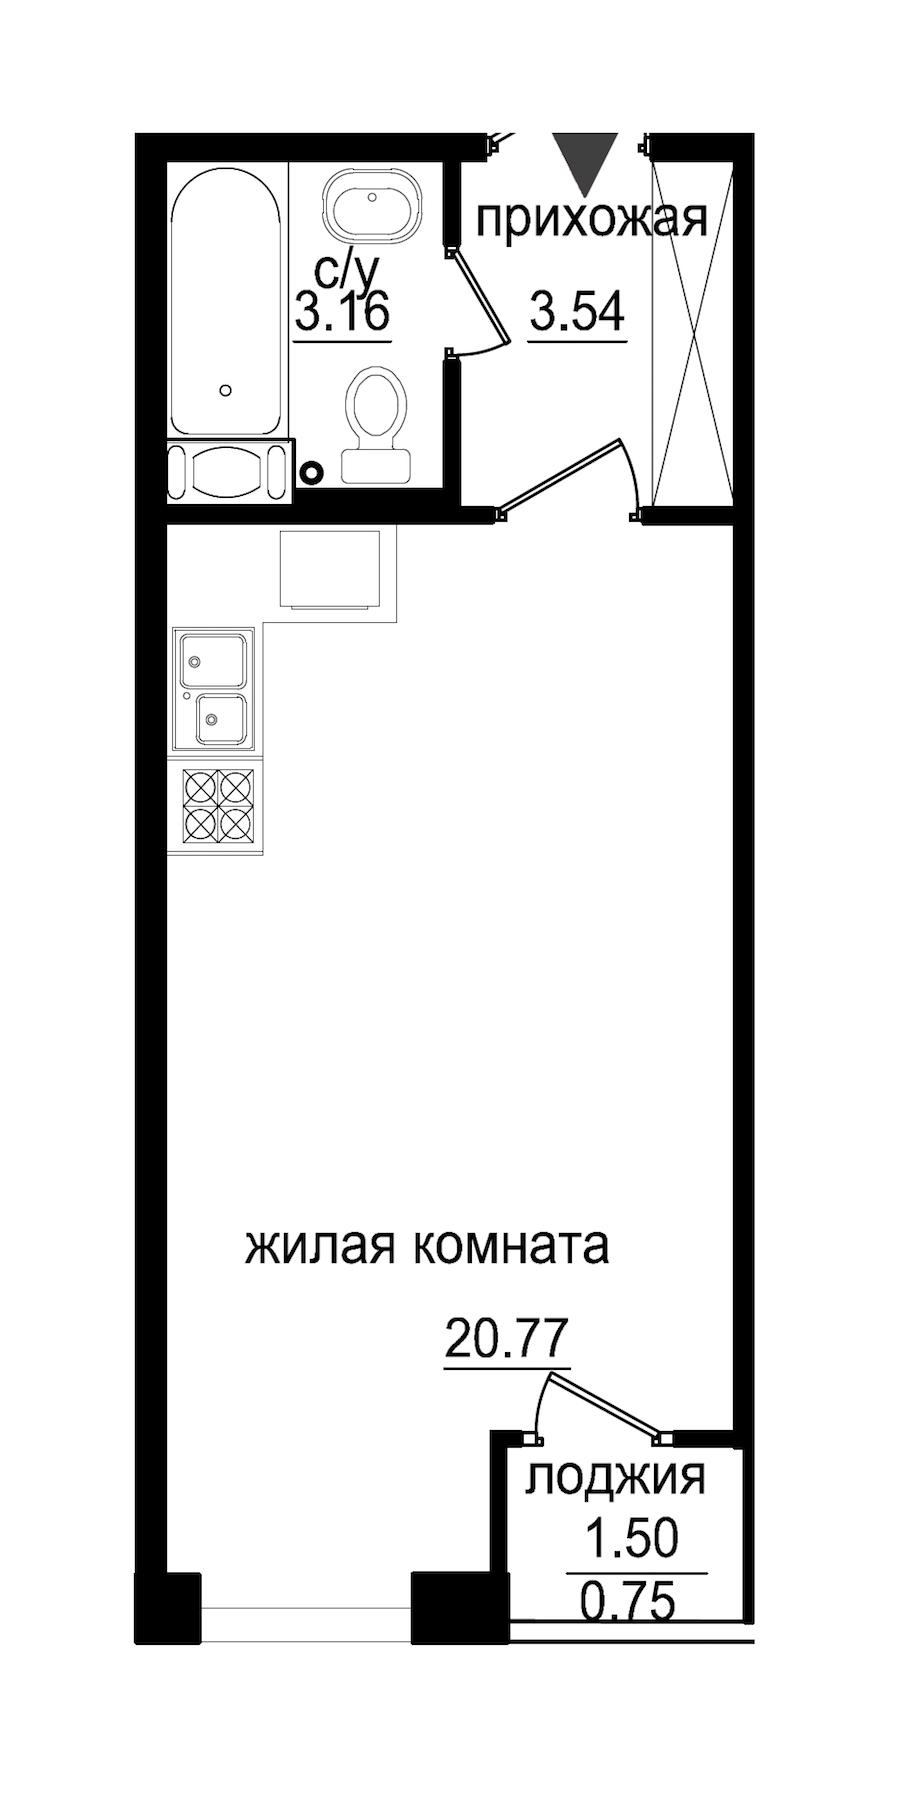 Студия 28 м<sup>2</sup> на 4 этаже